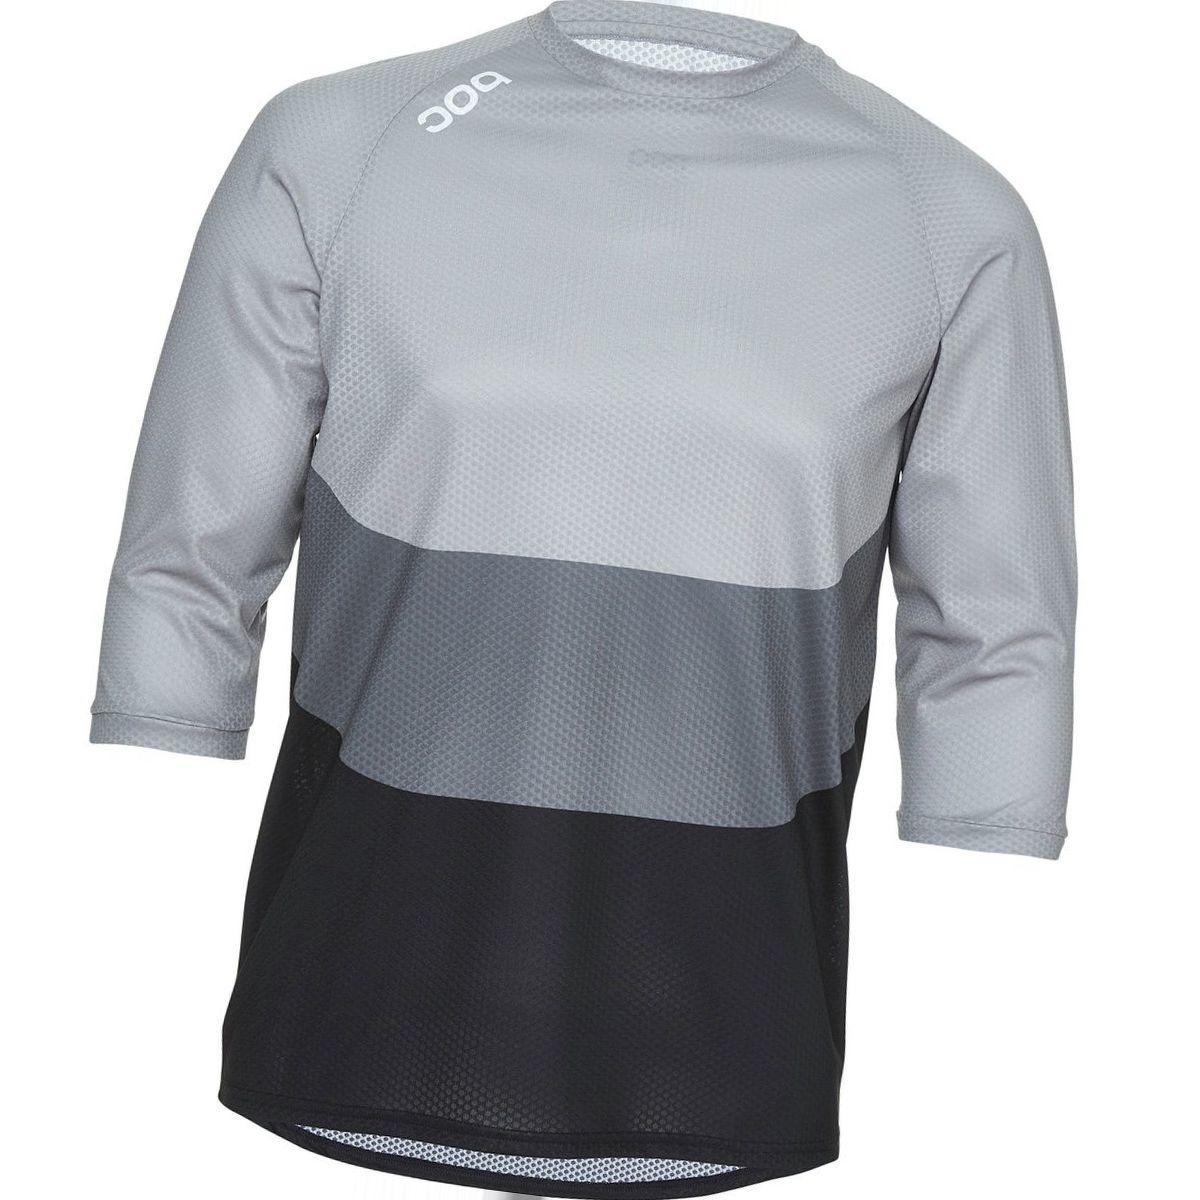 POC Essential Enduro 3/4 Light Jersey - Men's